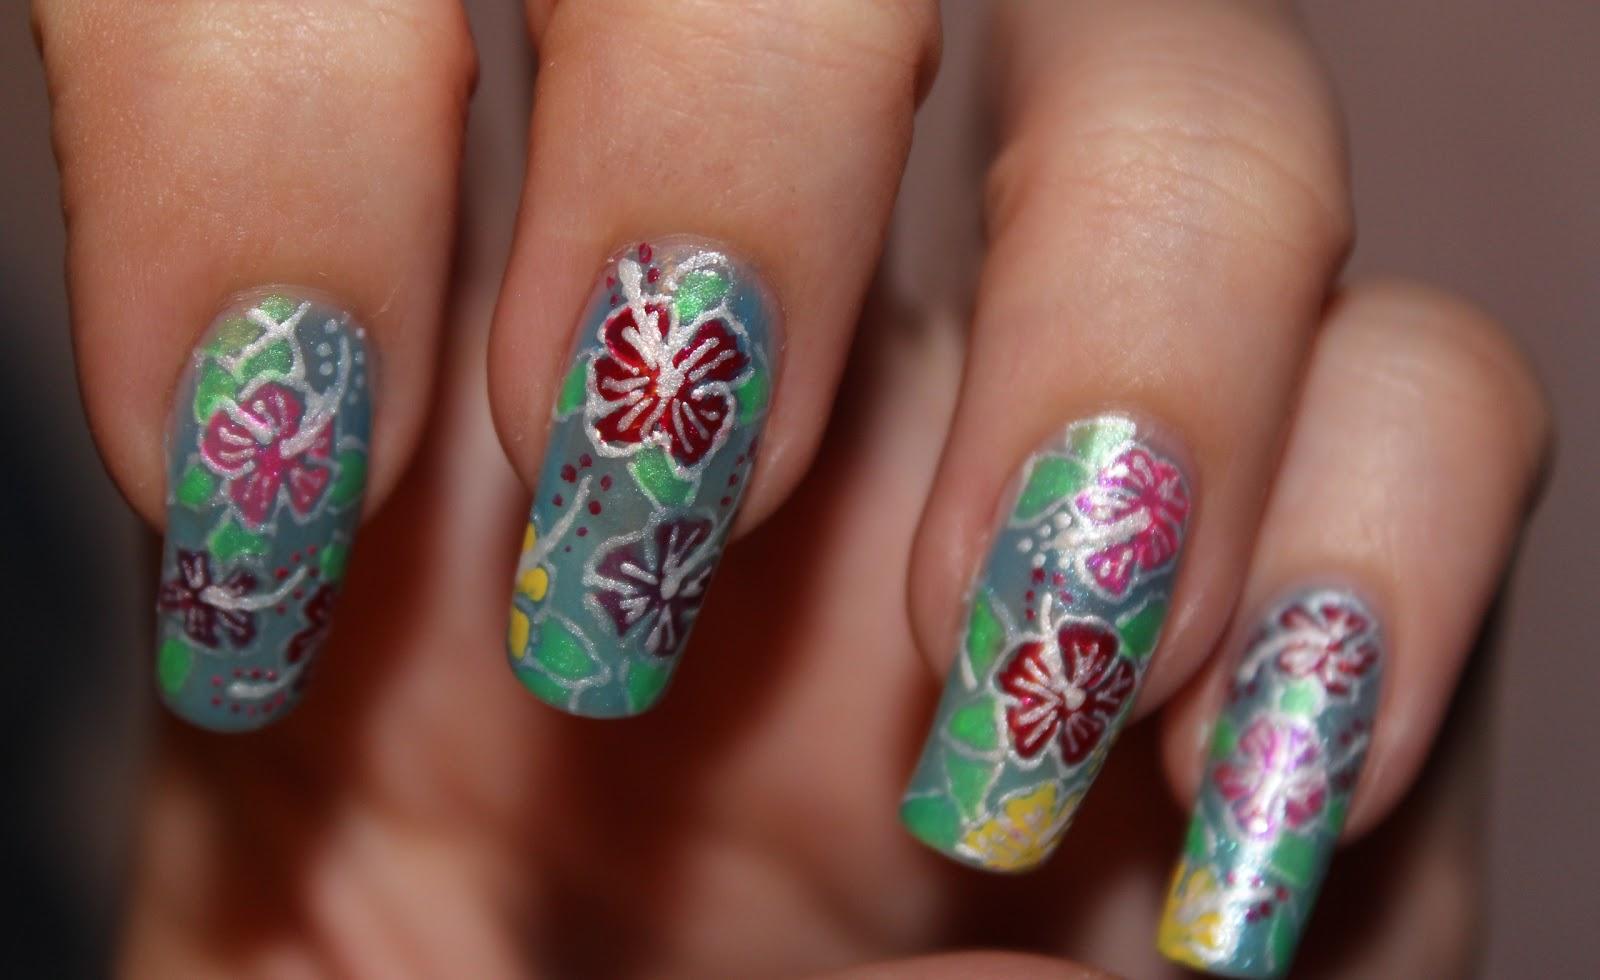 Nail design tutorials 2012 nail design hibiscus flowers nail art nail design hibiscus flowers nail art pens izmirmasajfo